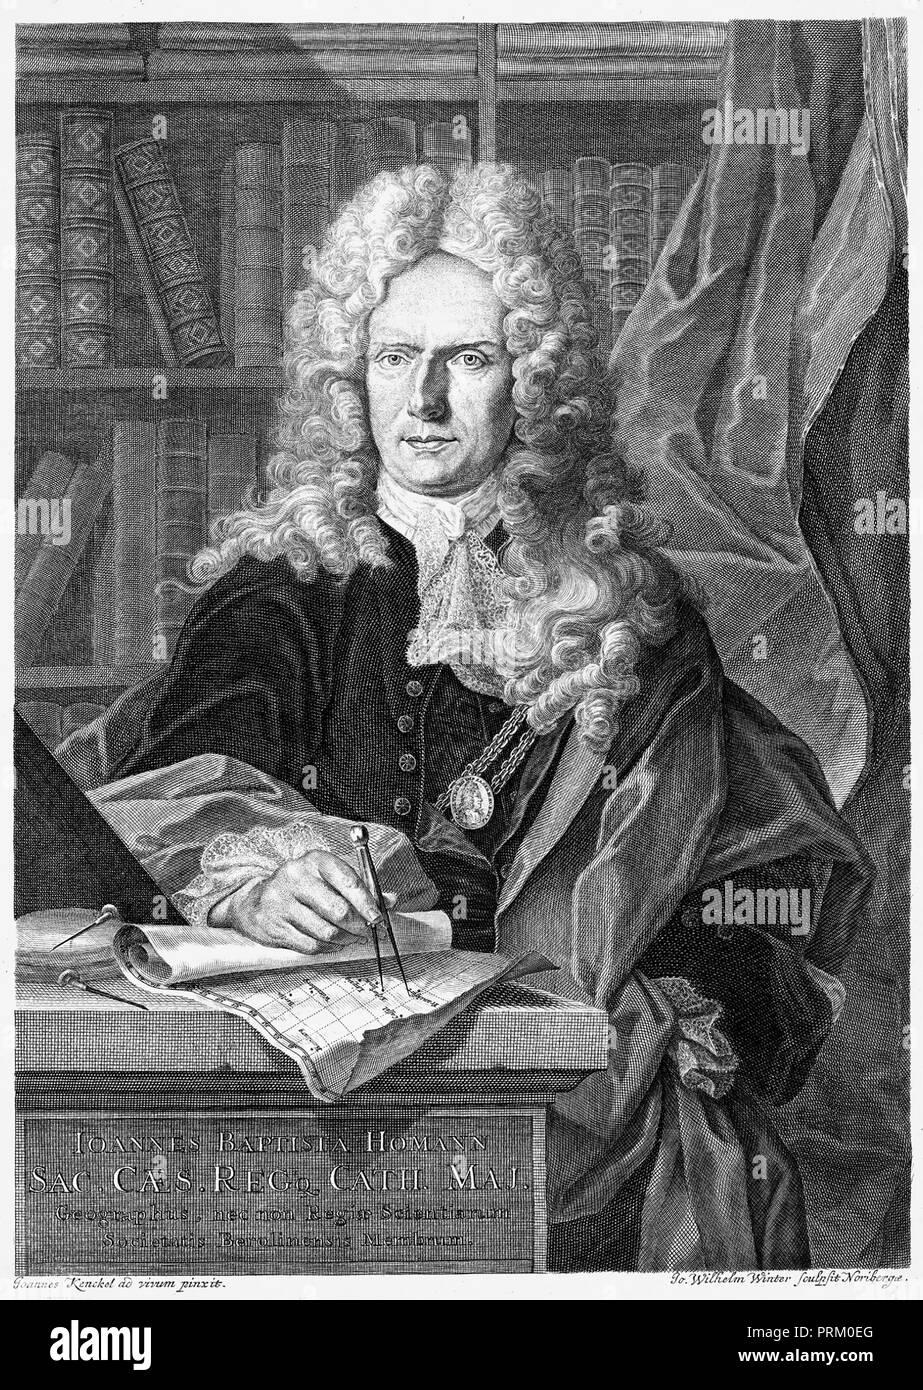 JOHANN BAPTIST HOMANN (1664-1724) German geographer and cartographer - Stock Image